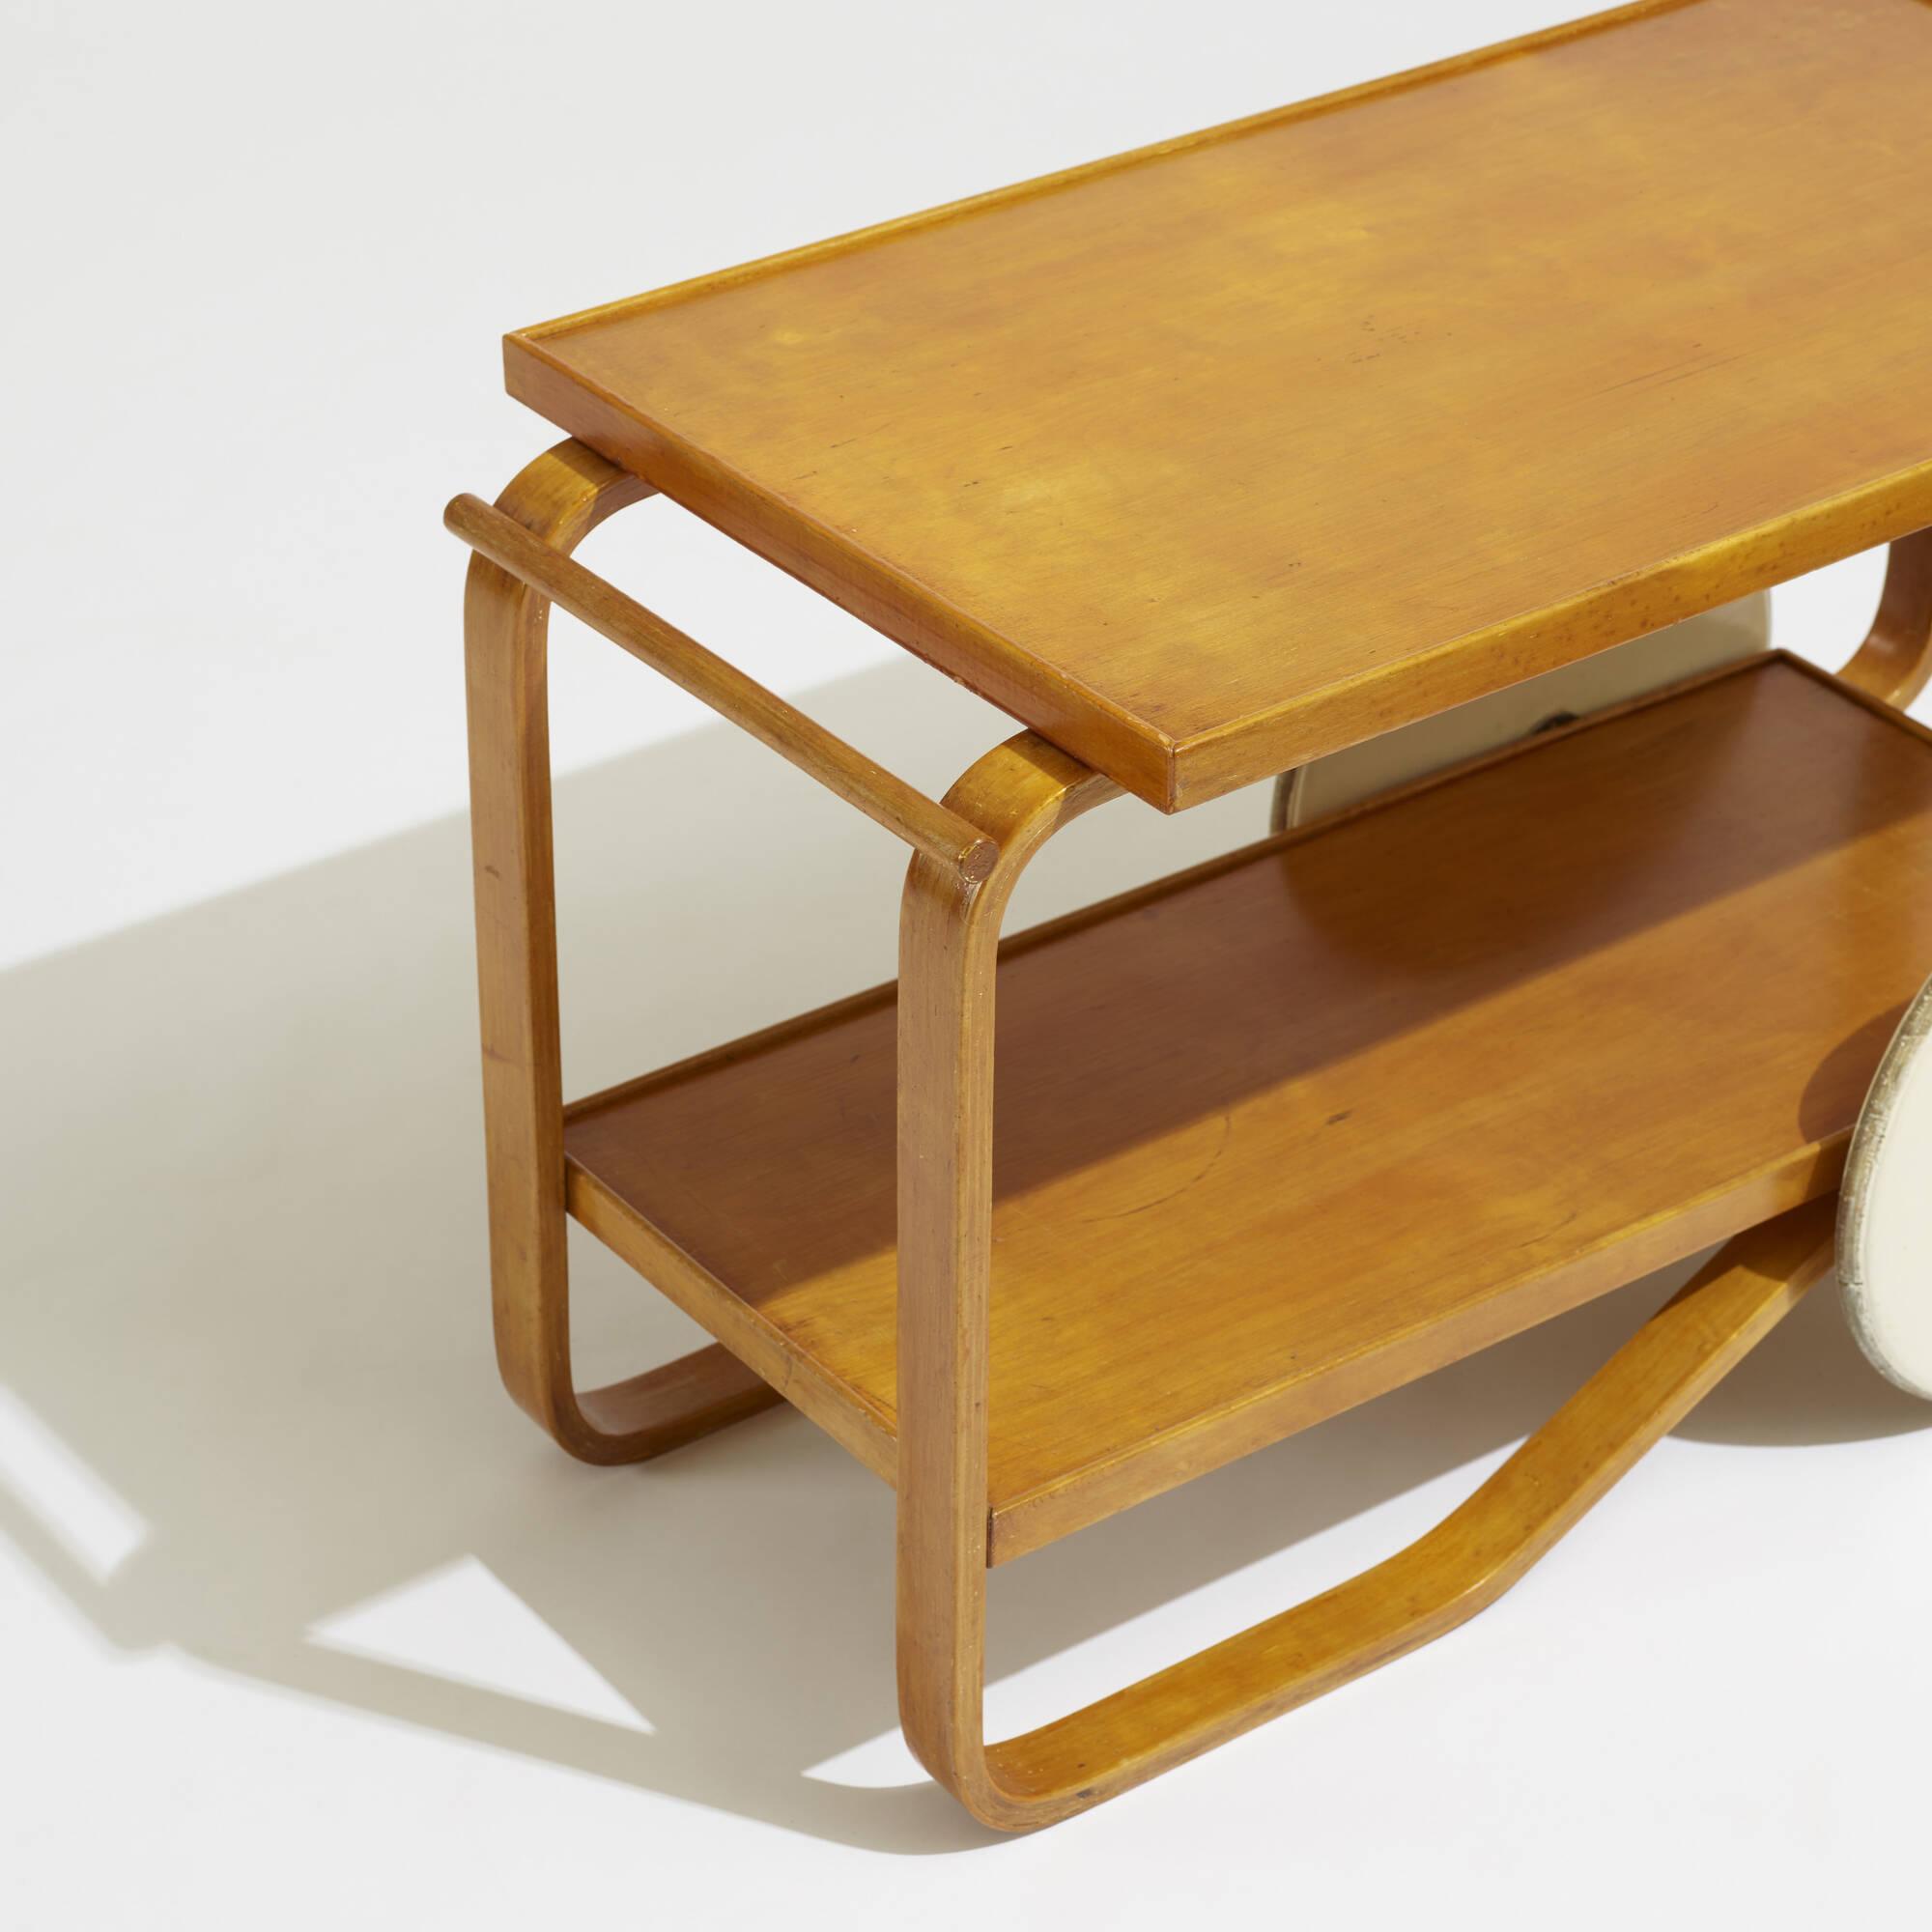 156: Alvar Aalto / tea trolley (3 of 3)